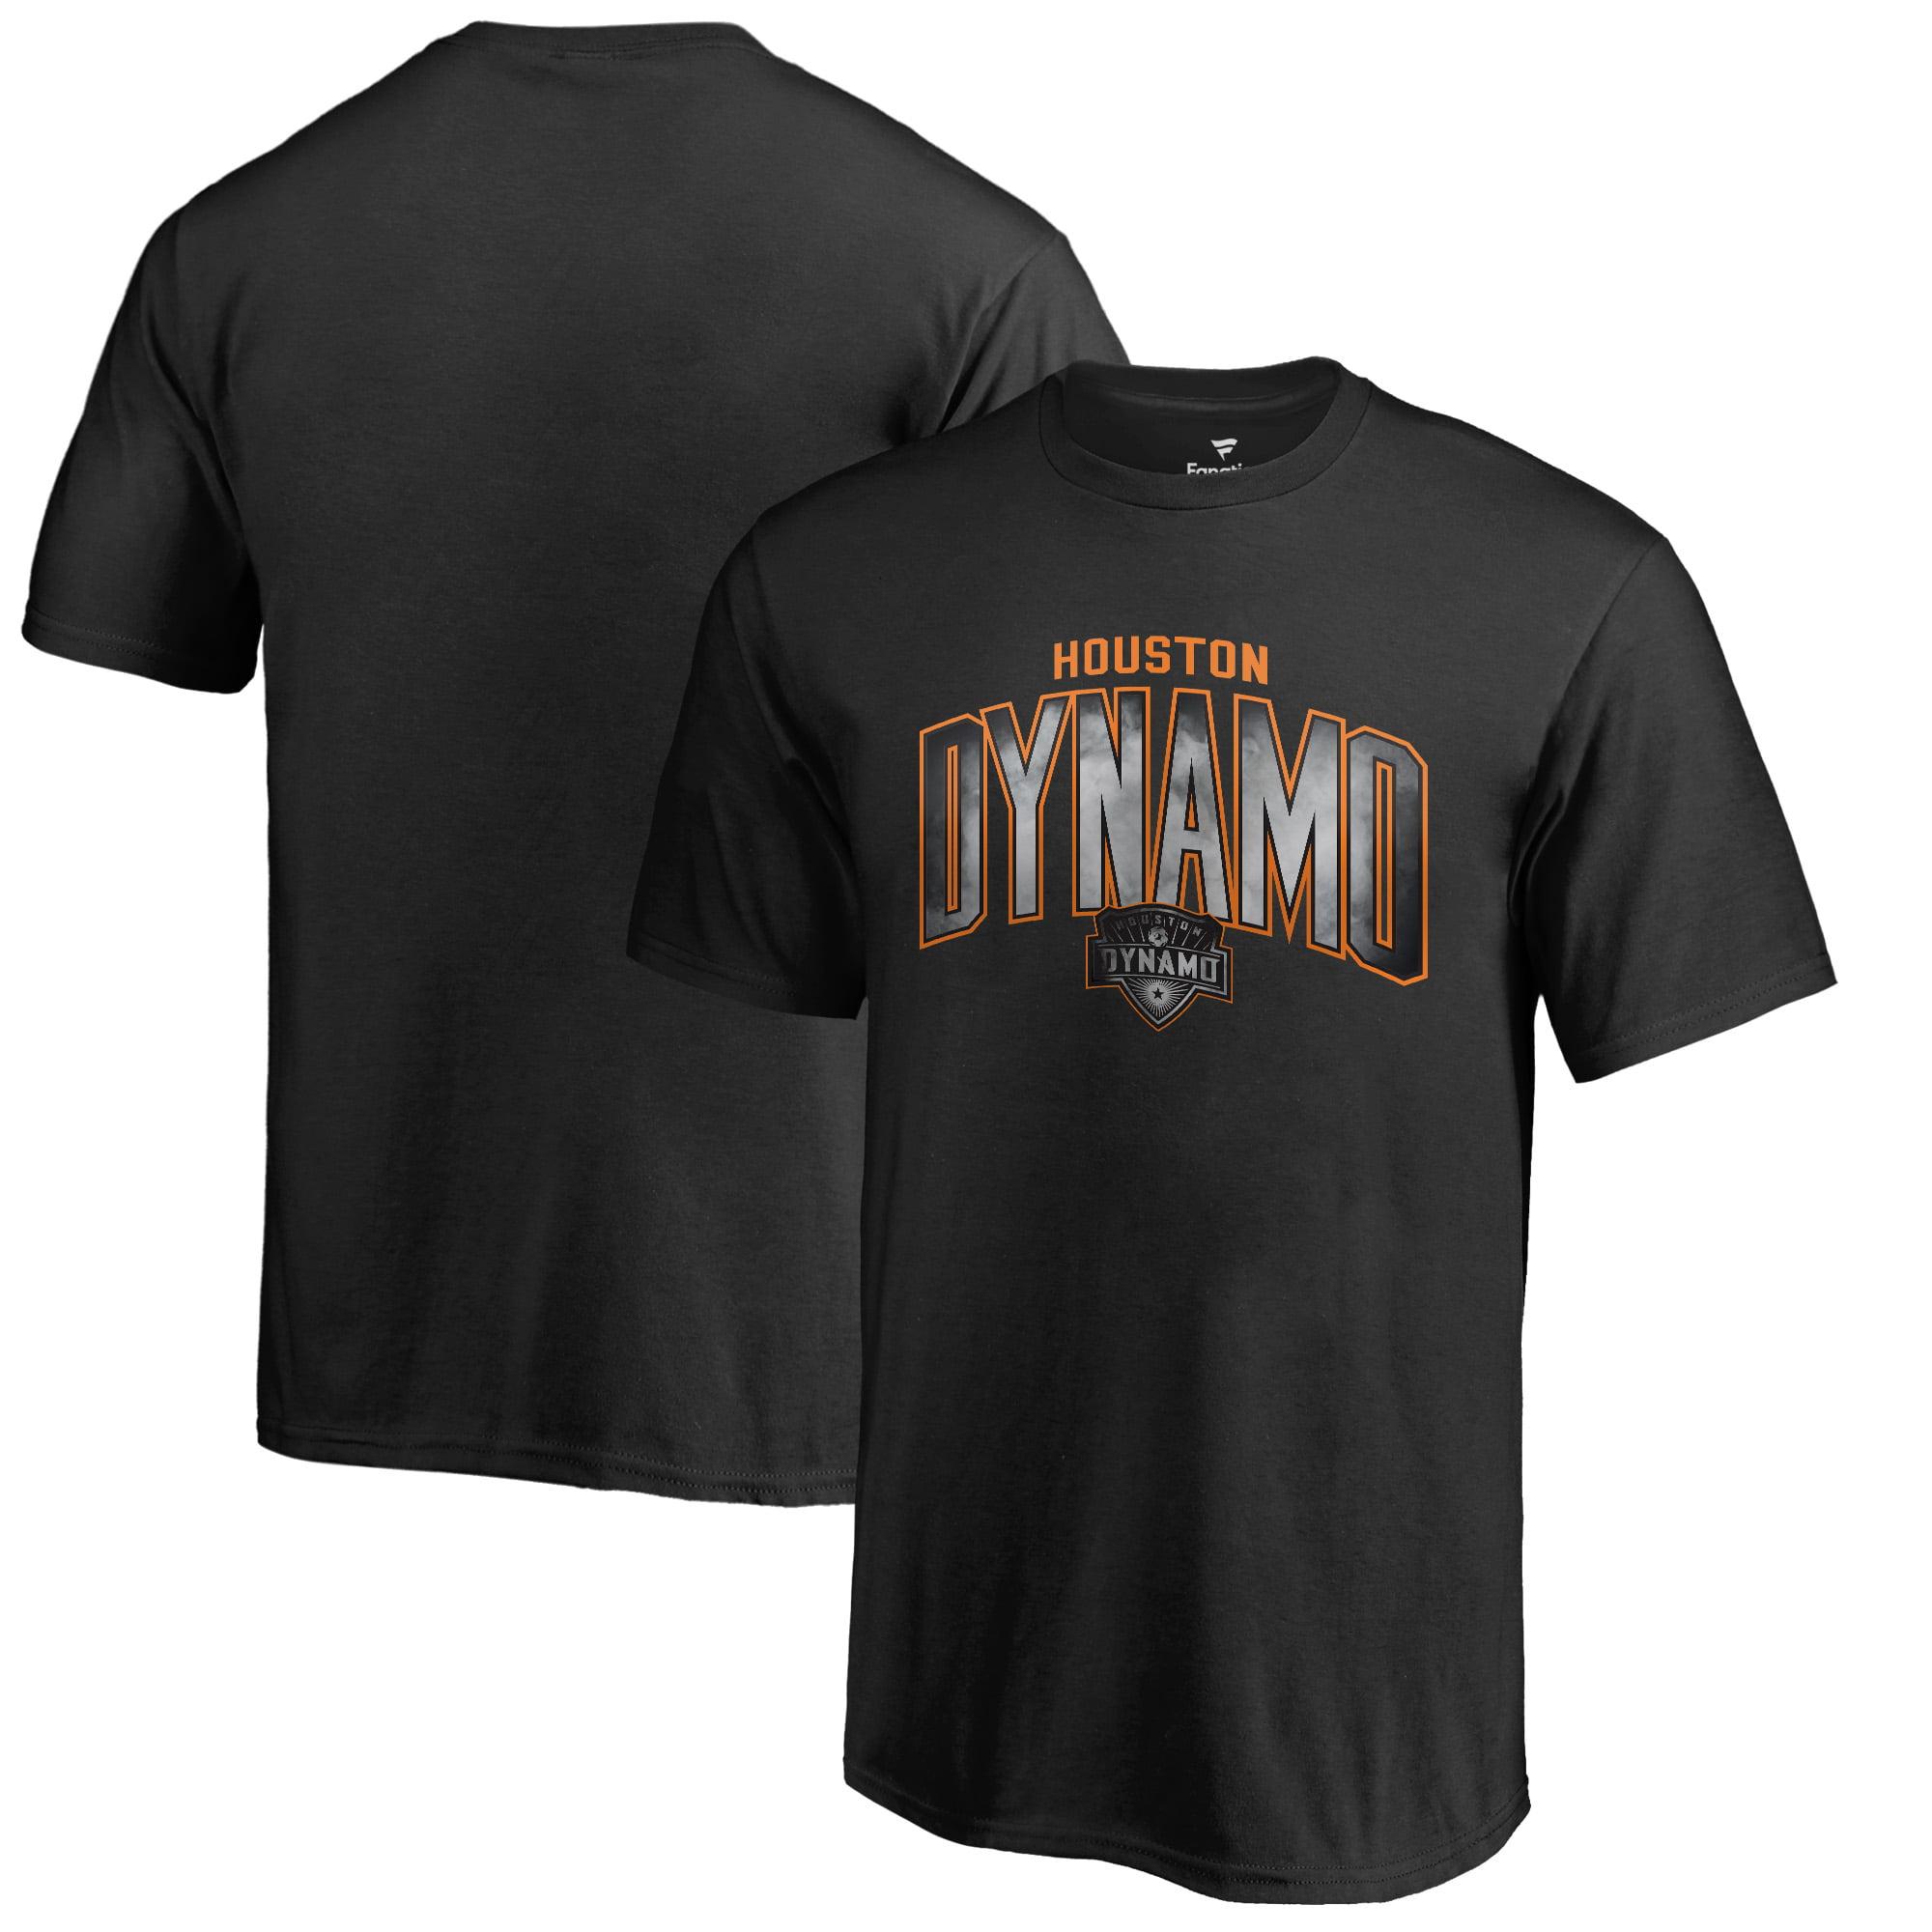 Houston Dynamo Fanatics Branded Youth Black Arch Smoke T-Shirt